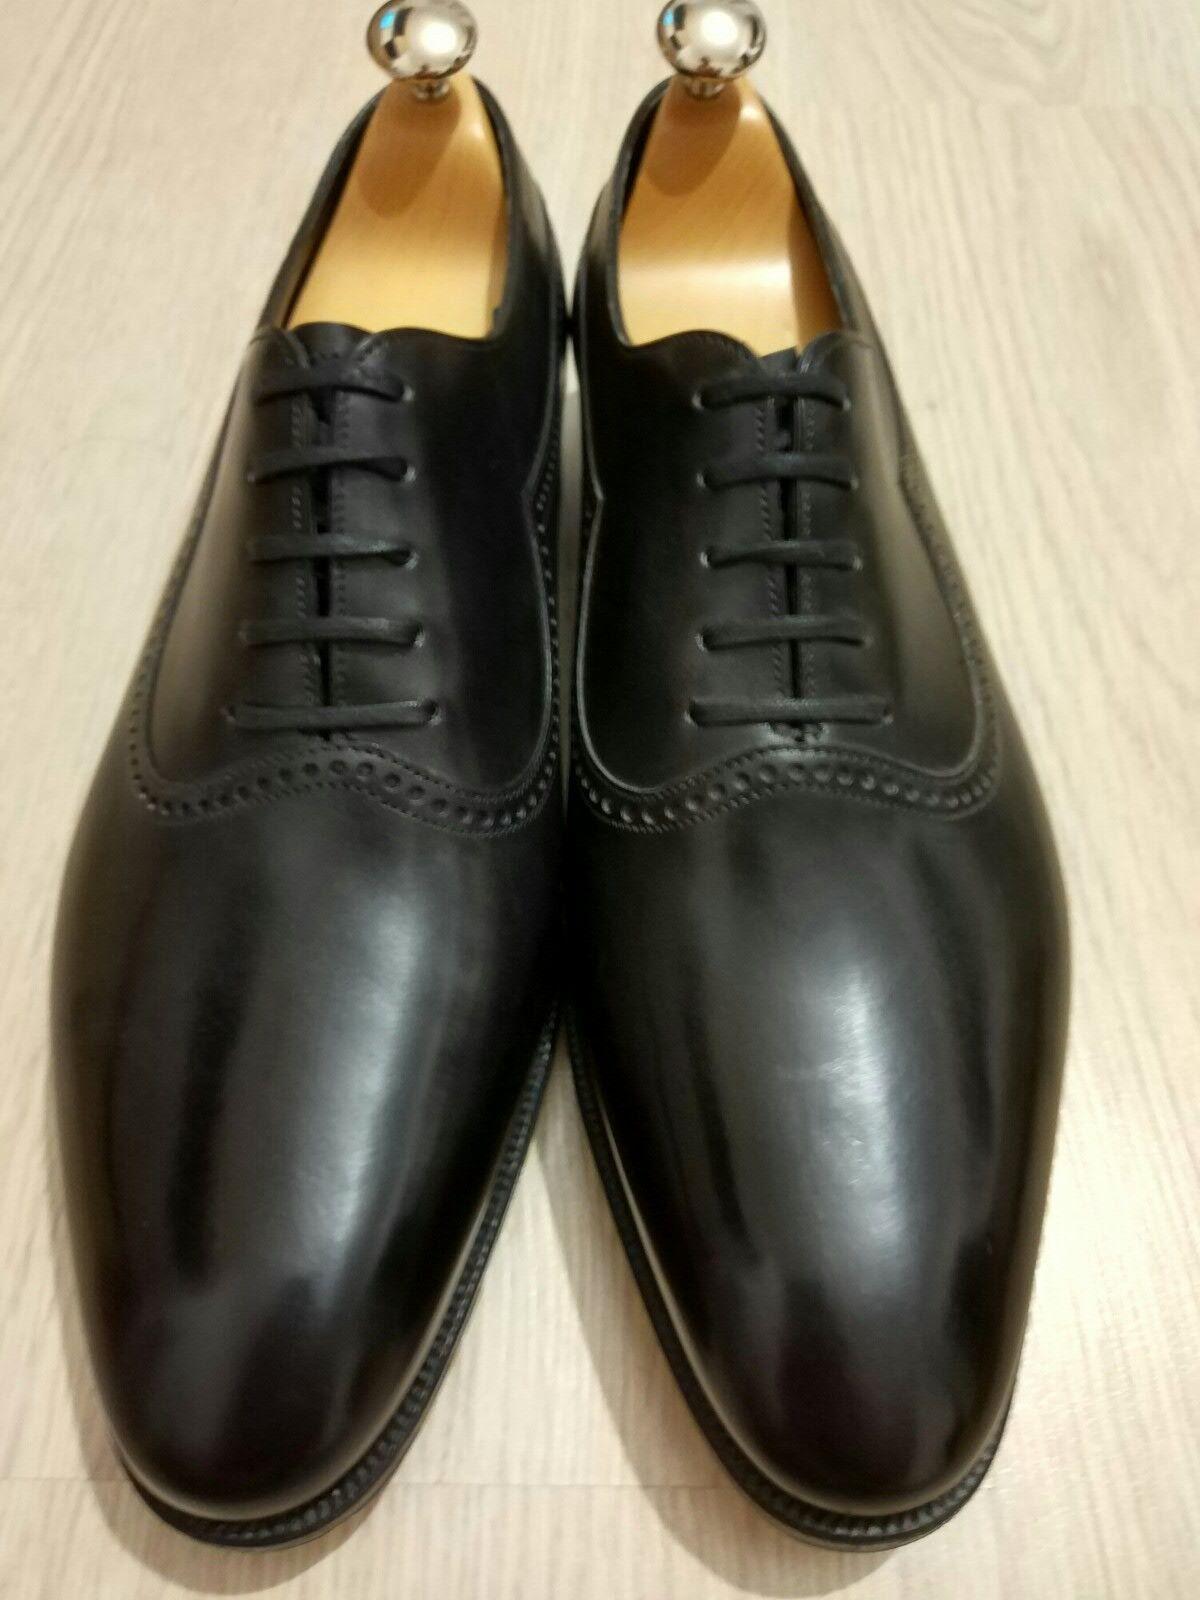 JOHN LOBB PRESTIGE Zapatos rojohley 9 Extra Ancho EE. UU. 9.5